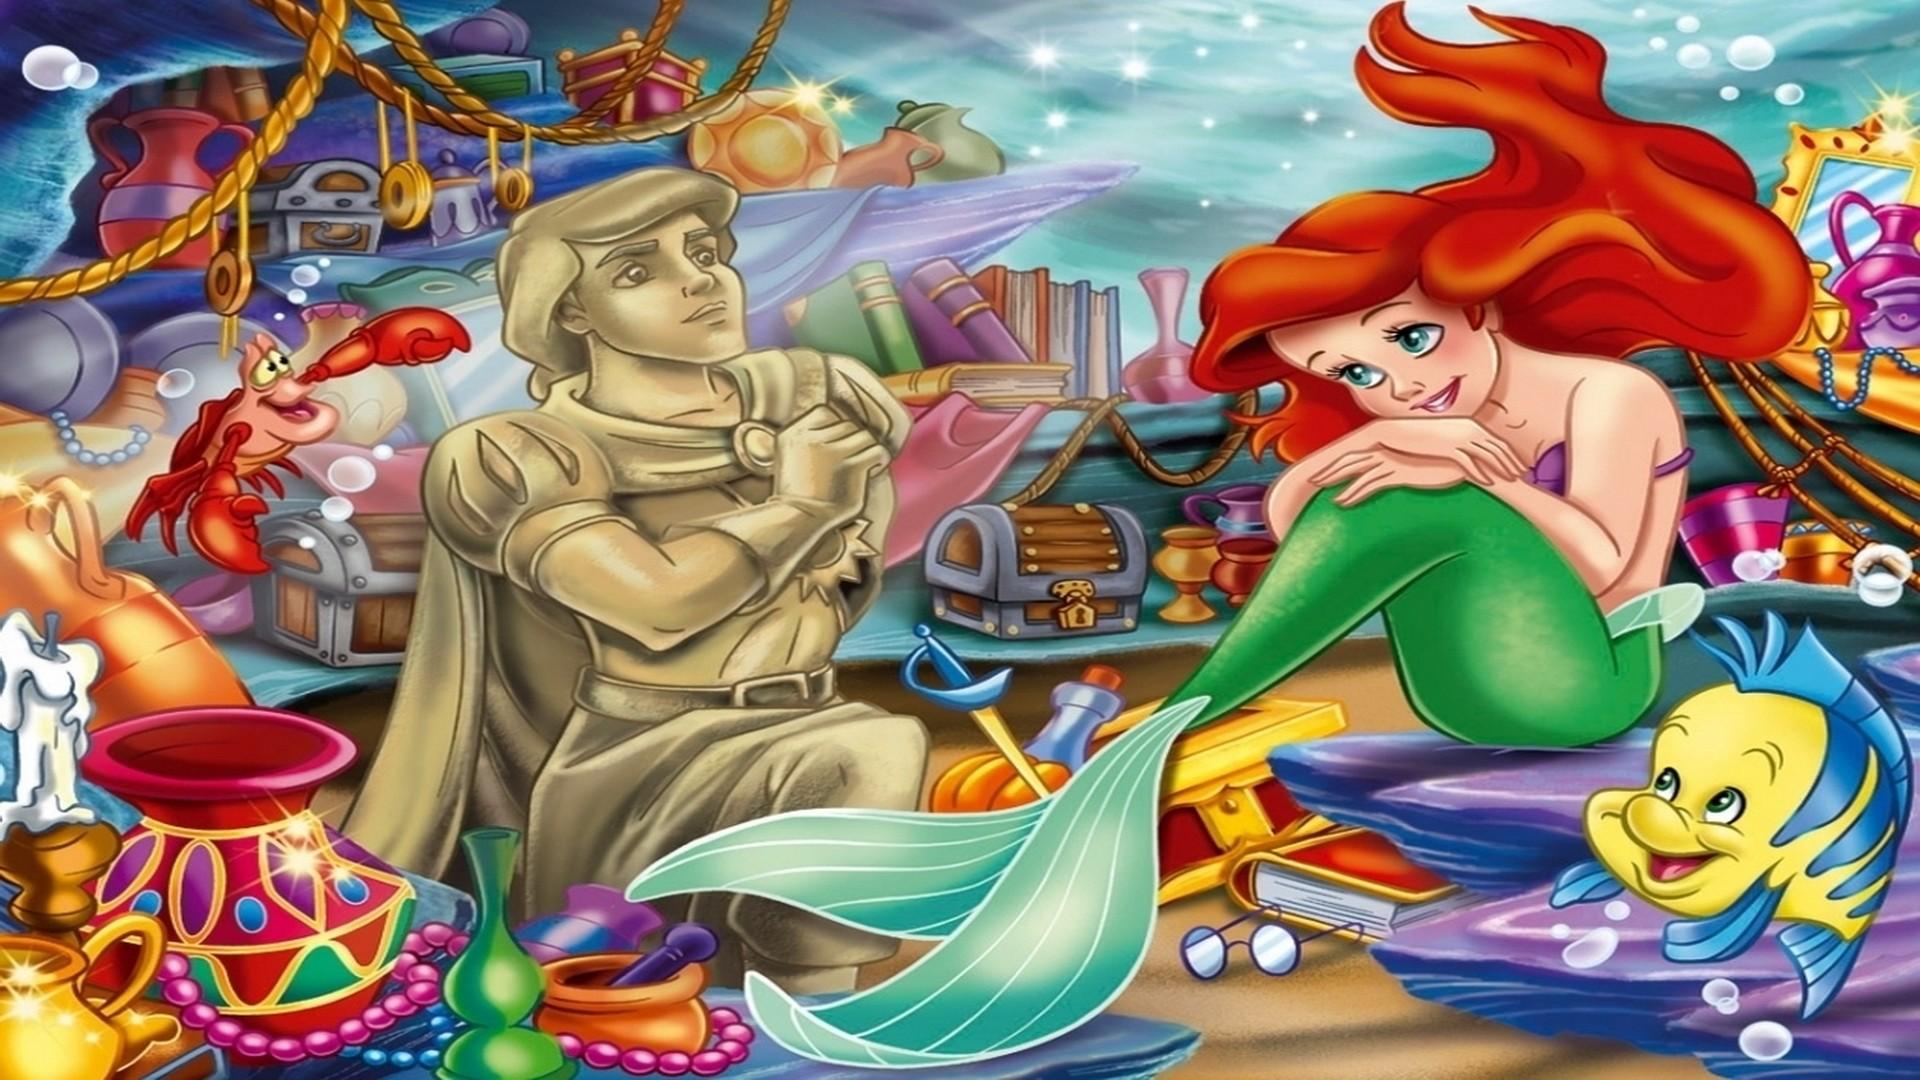 Little Mermaid background ·① Download free stunning full ...